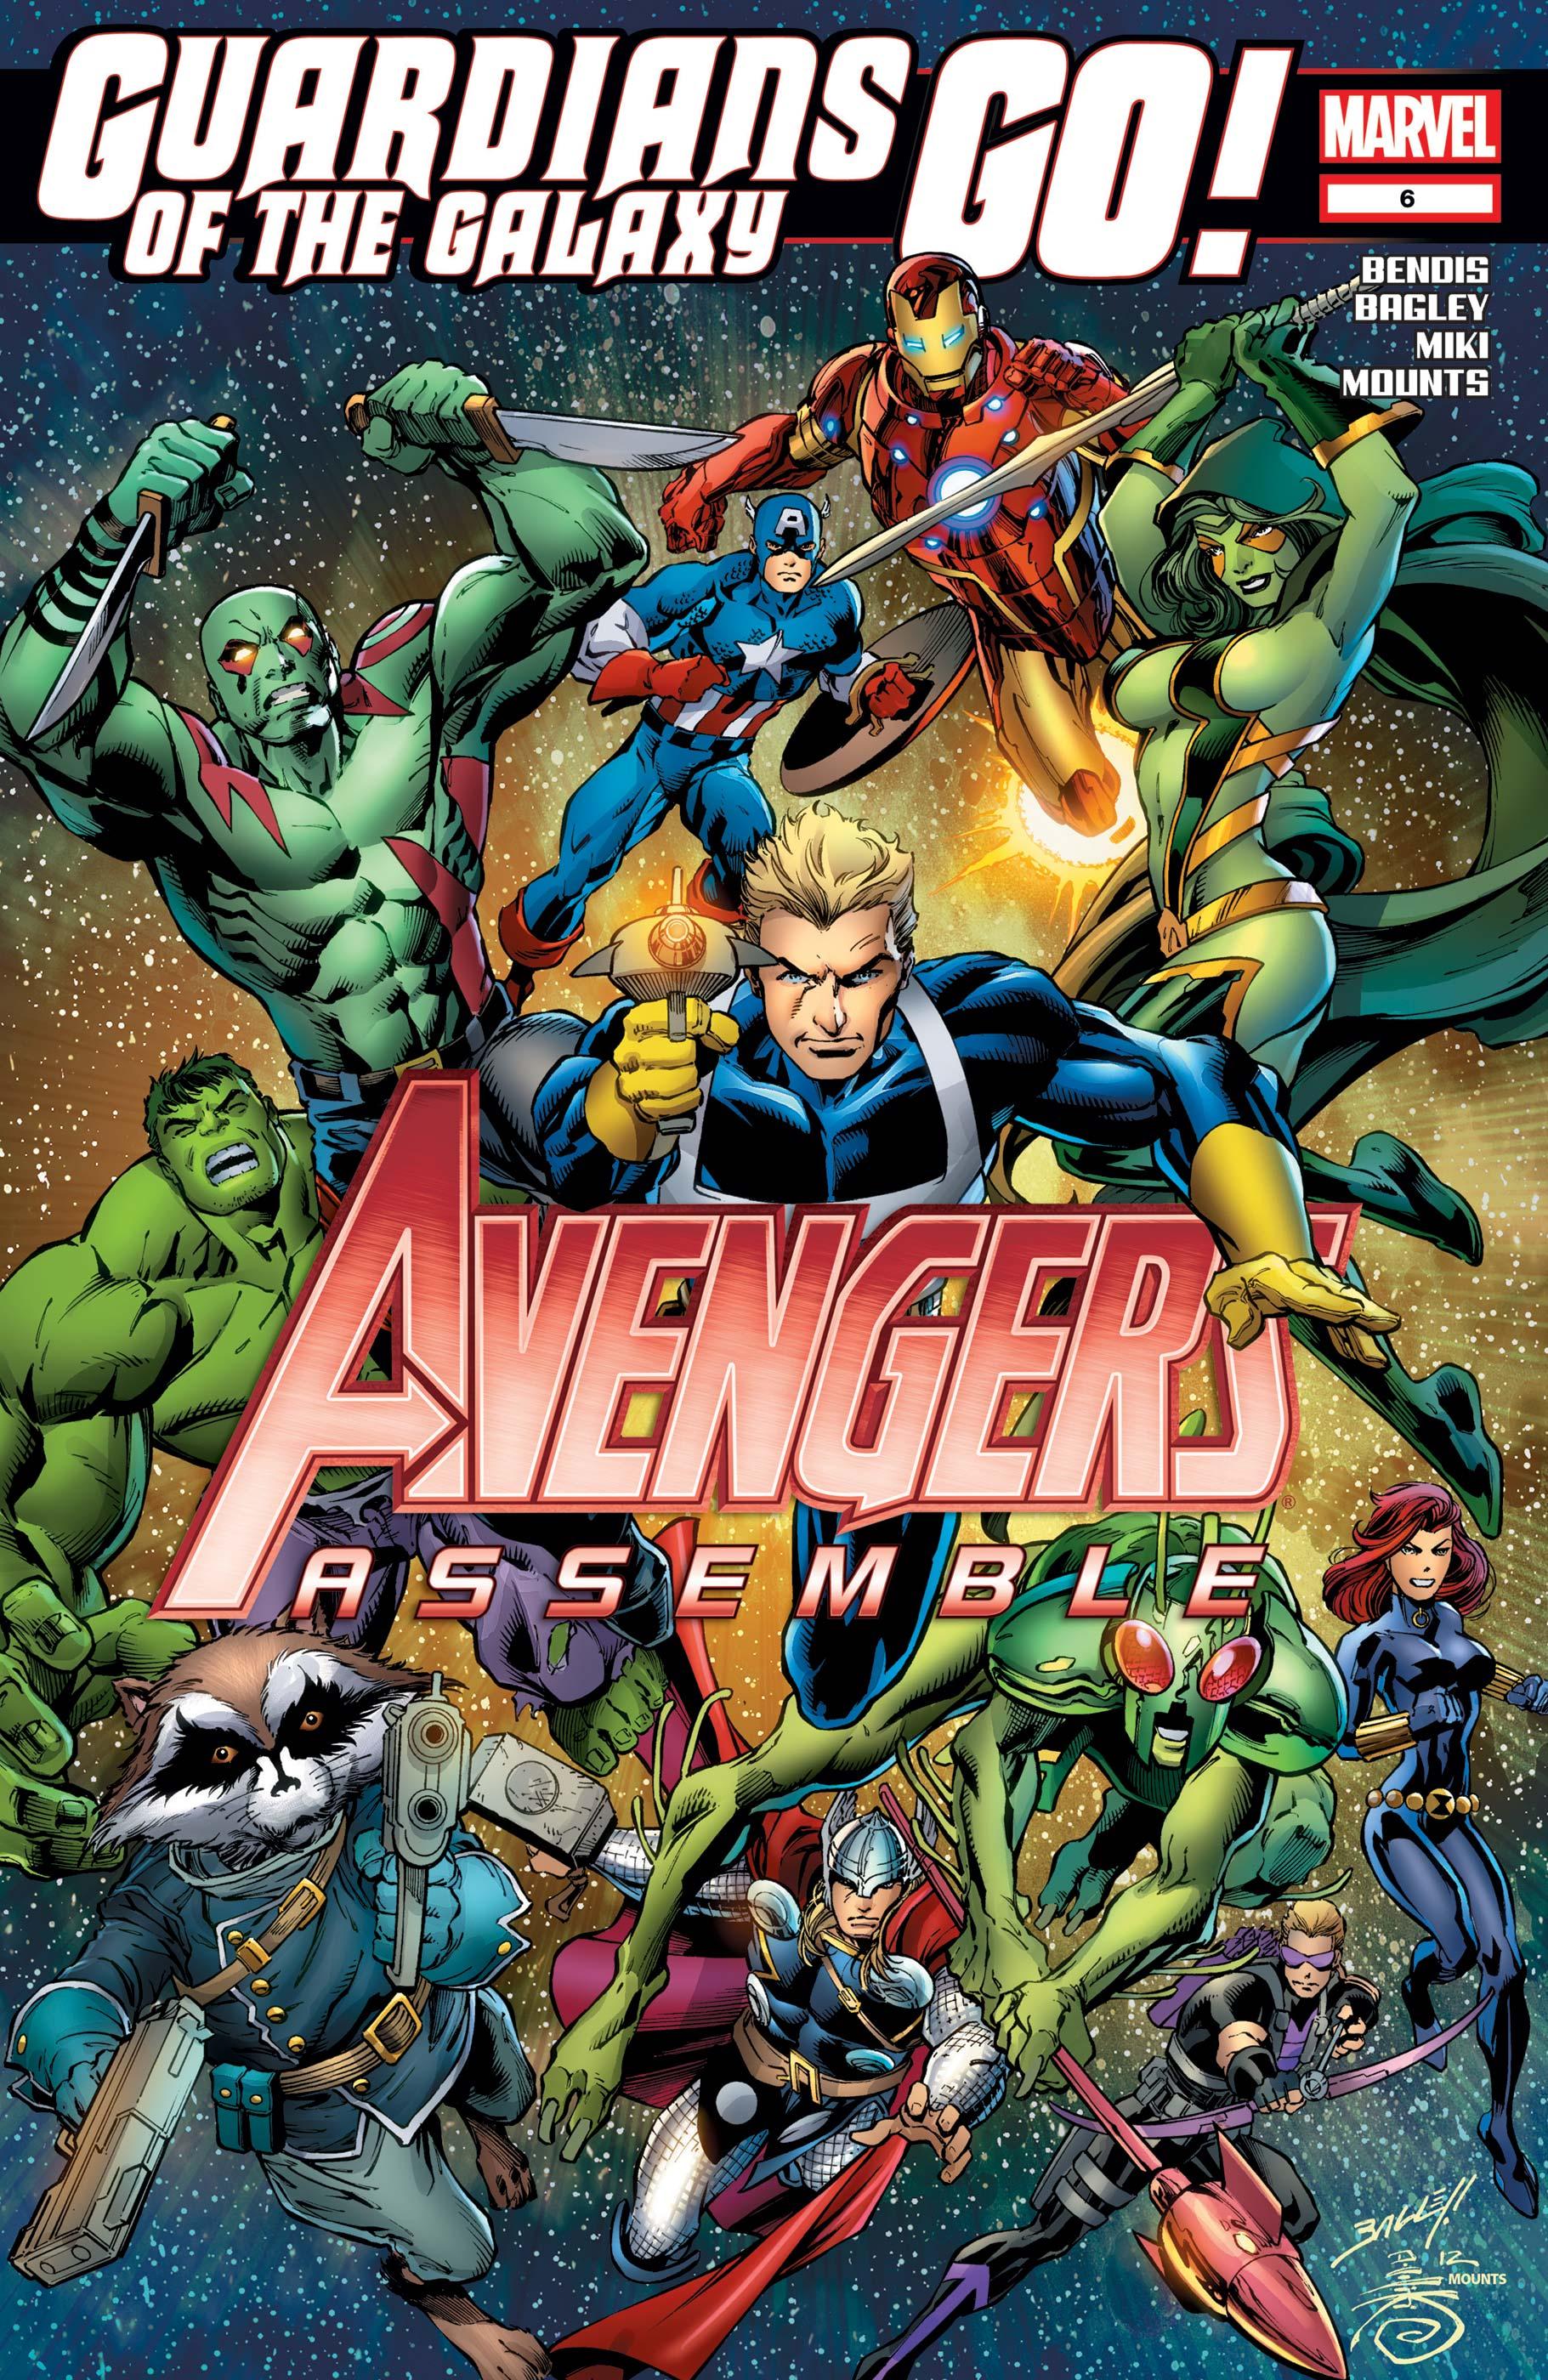 Avengers Assemble (2012) #6